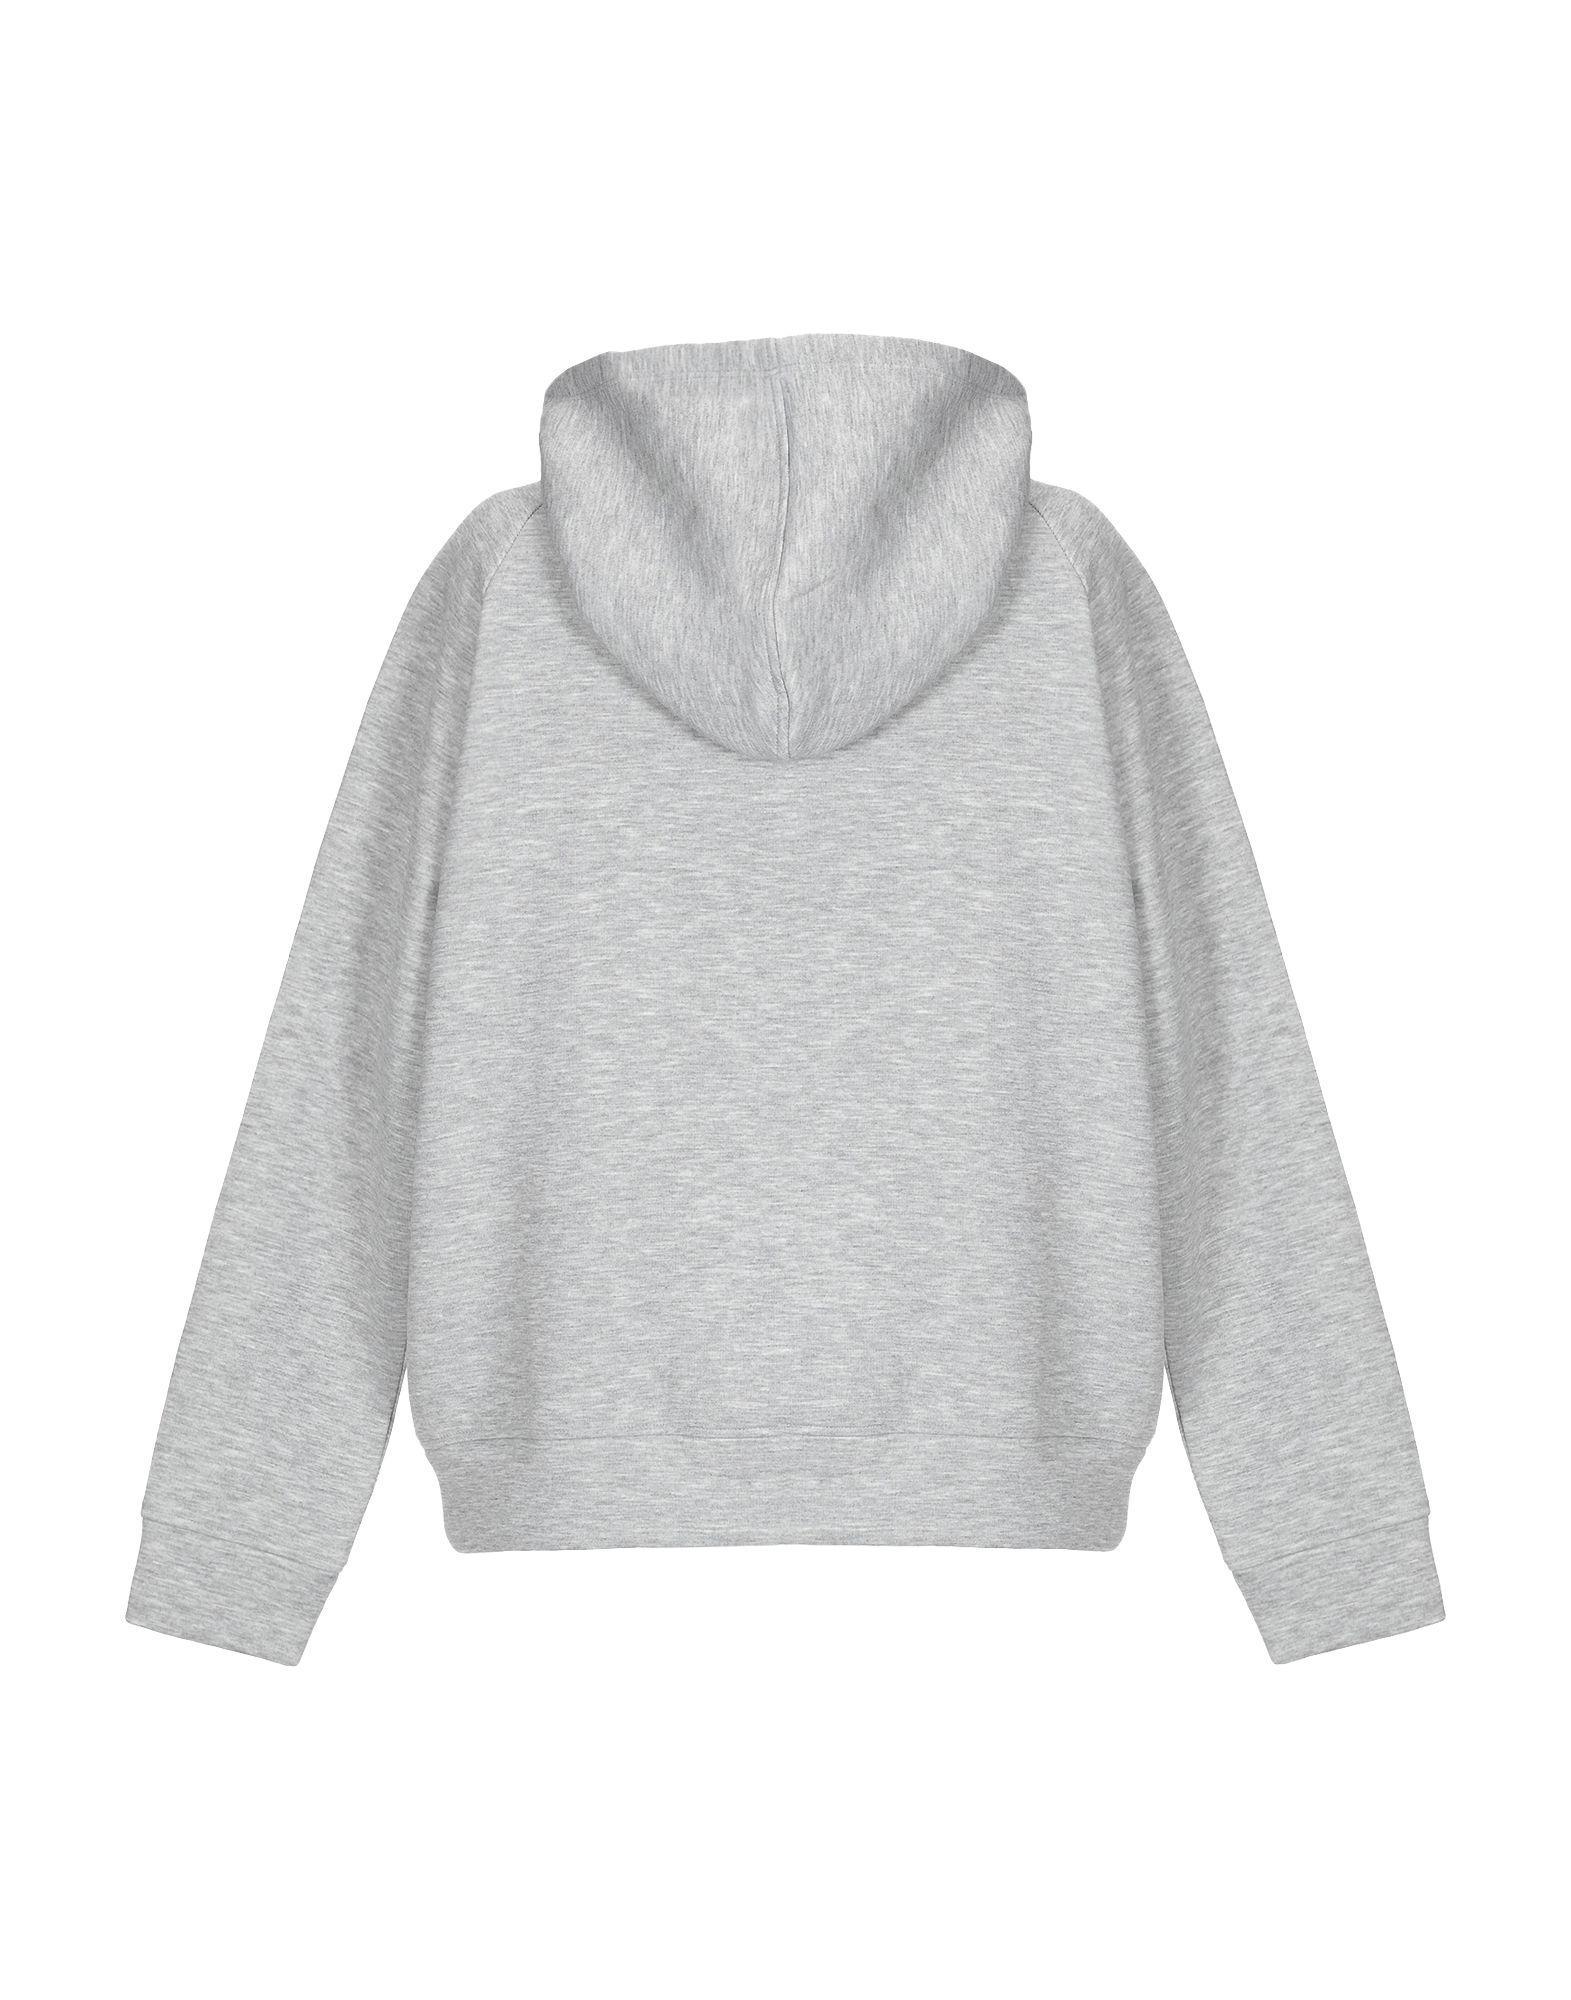 8c98f2ff52 Lyst - Maje Sweatshirt in Gray